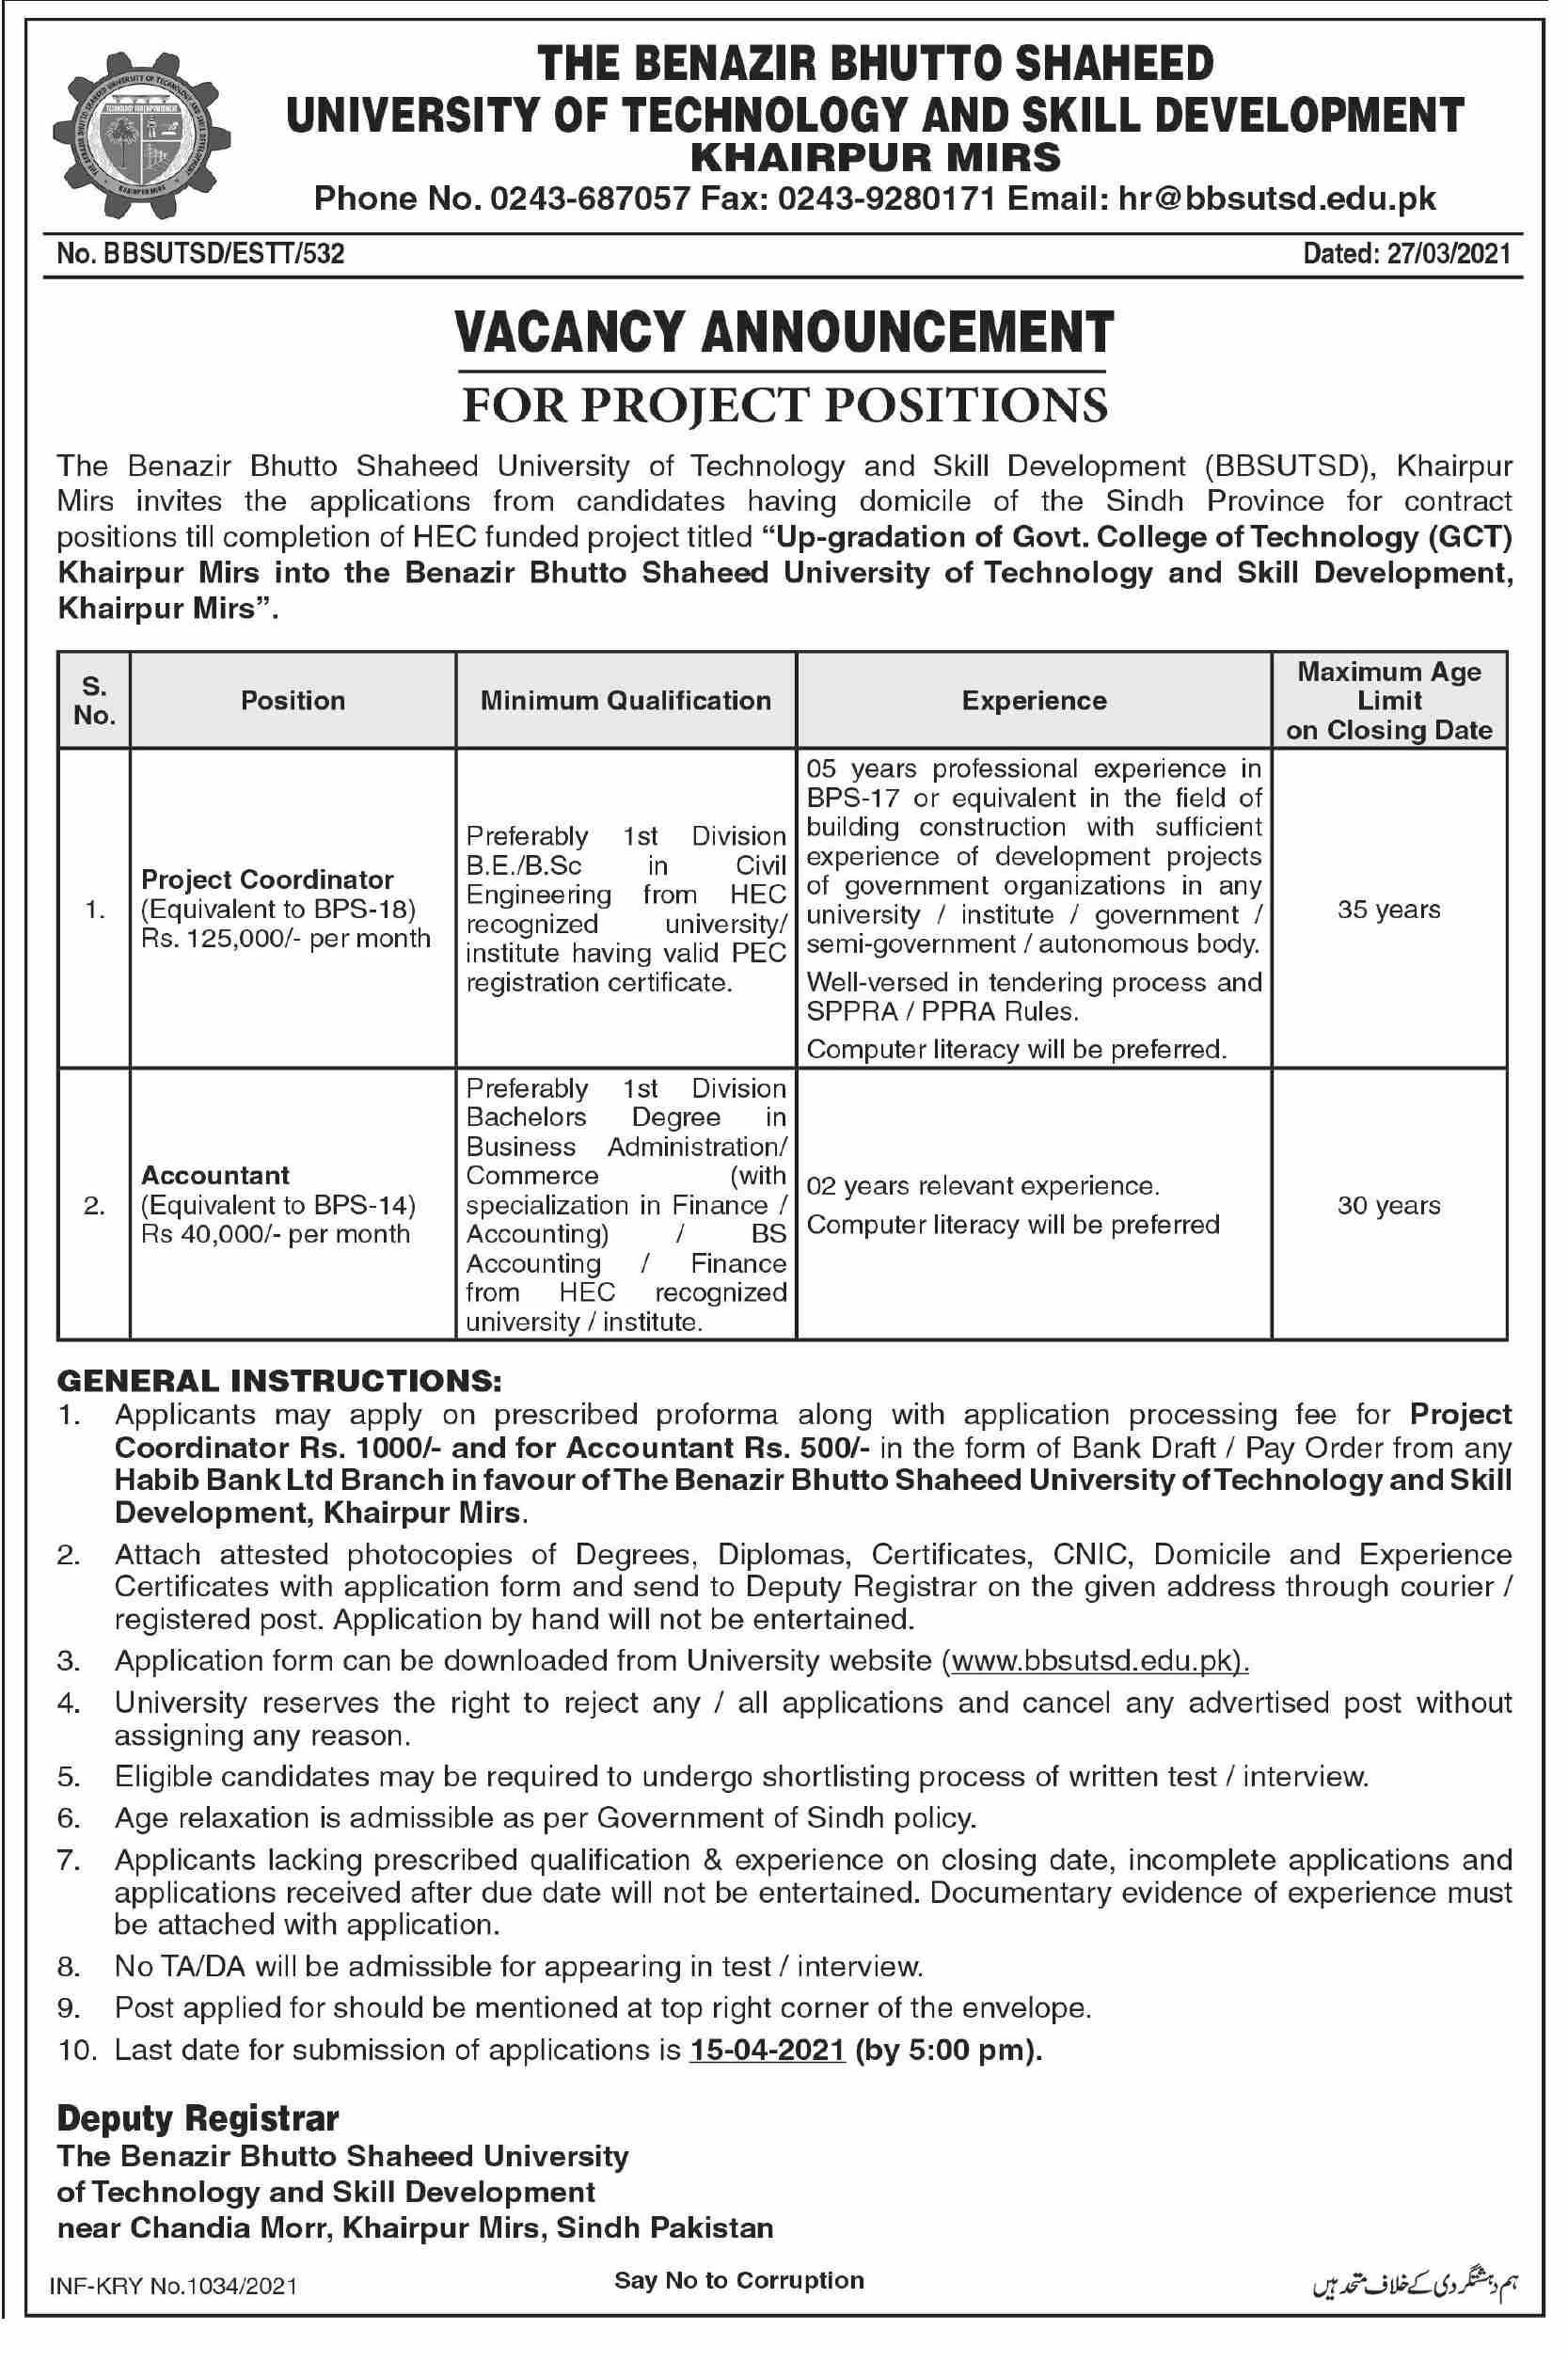 Benzair Bhutto Shaheed University of Technology Jobs 2021